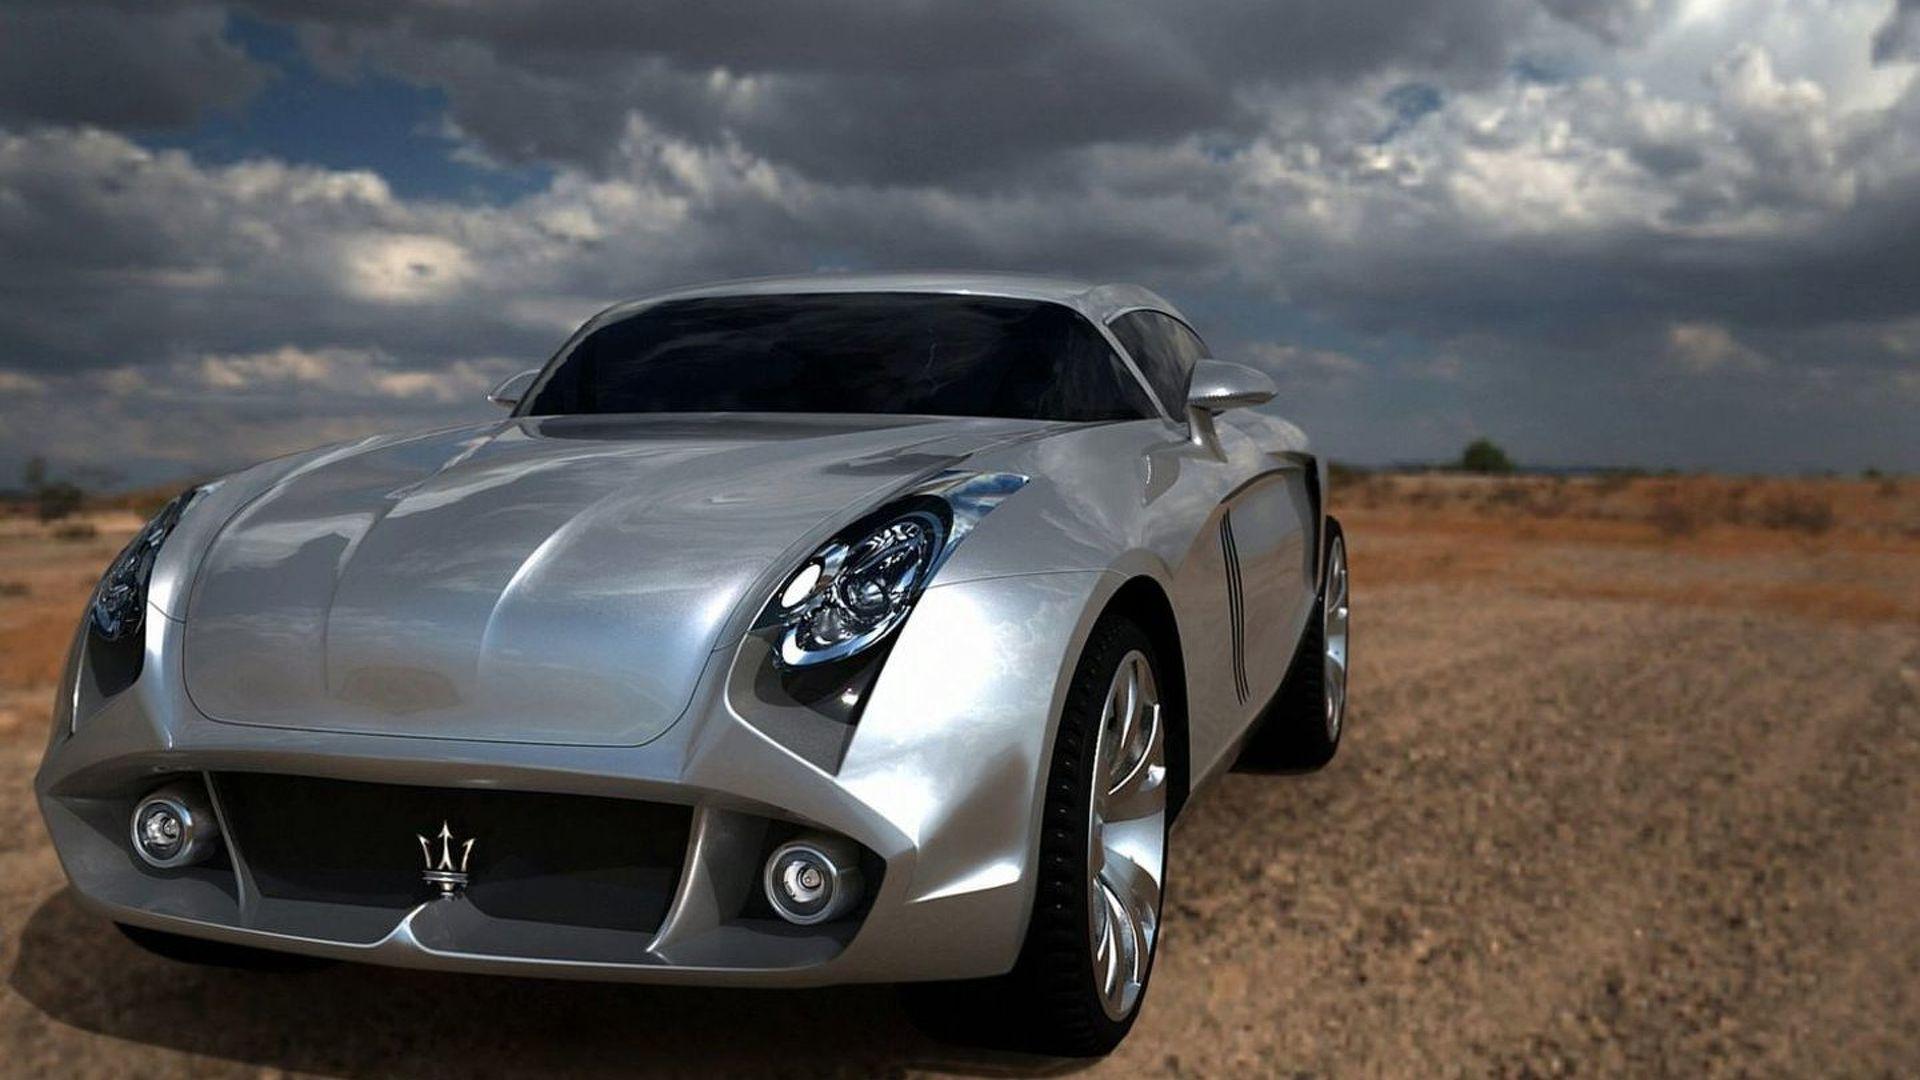 Maserati Kuba Concept Design Project